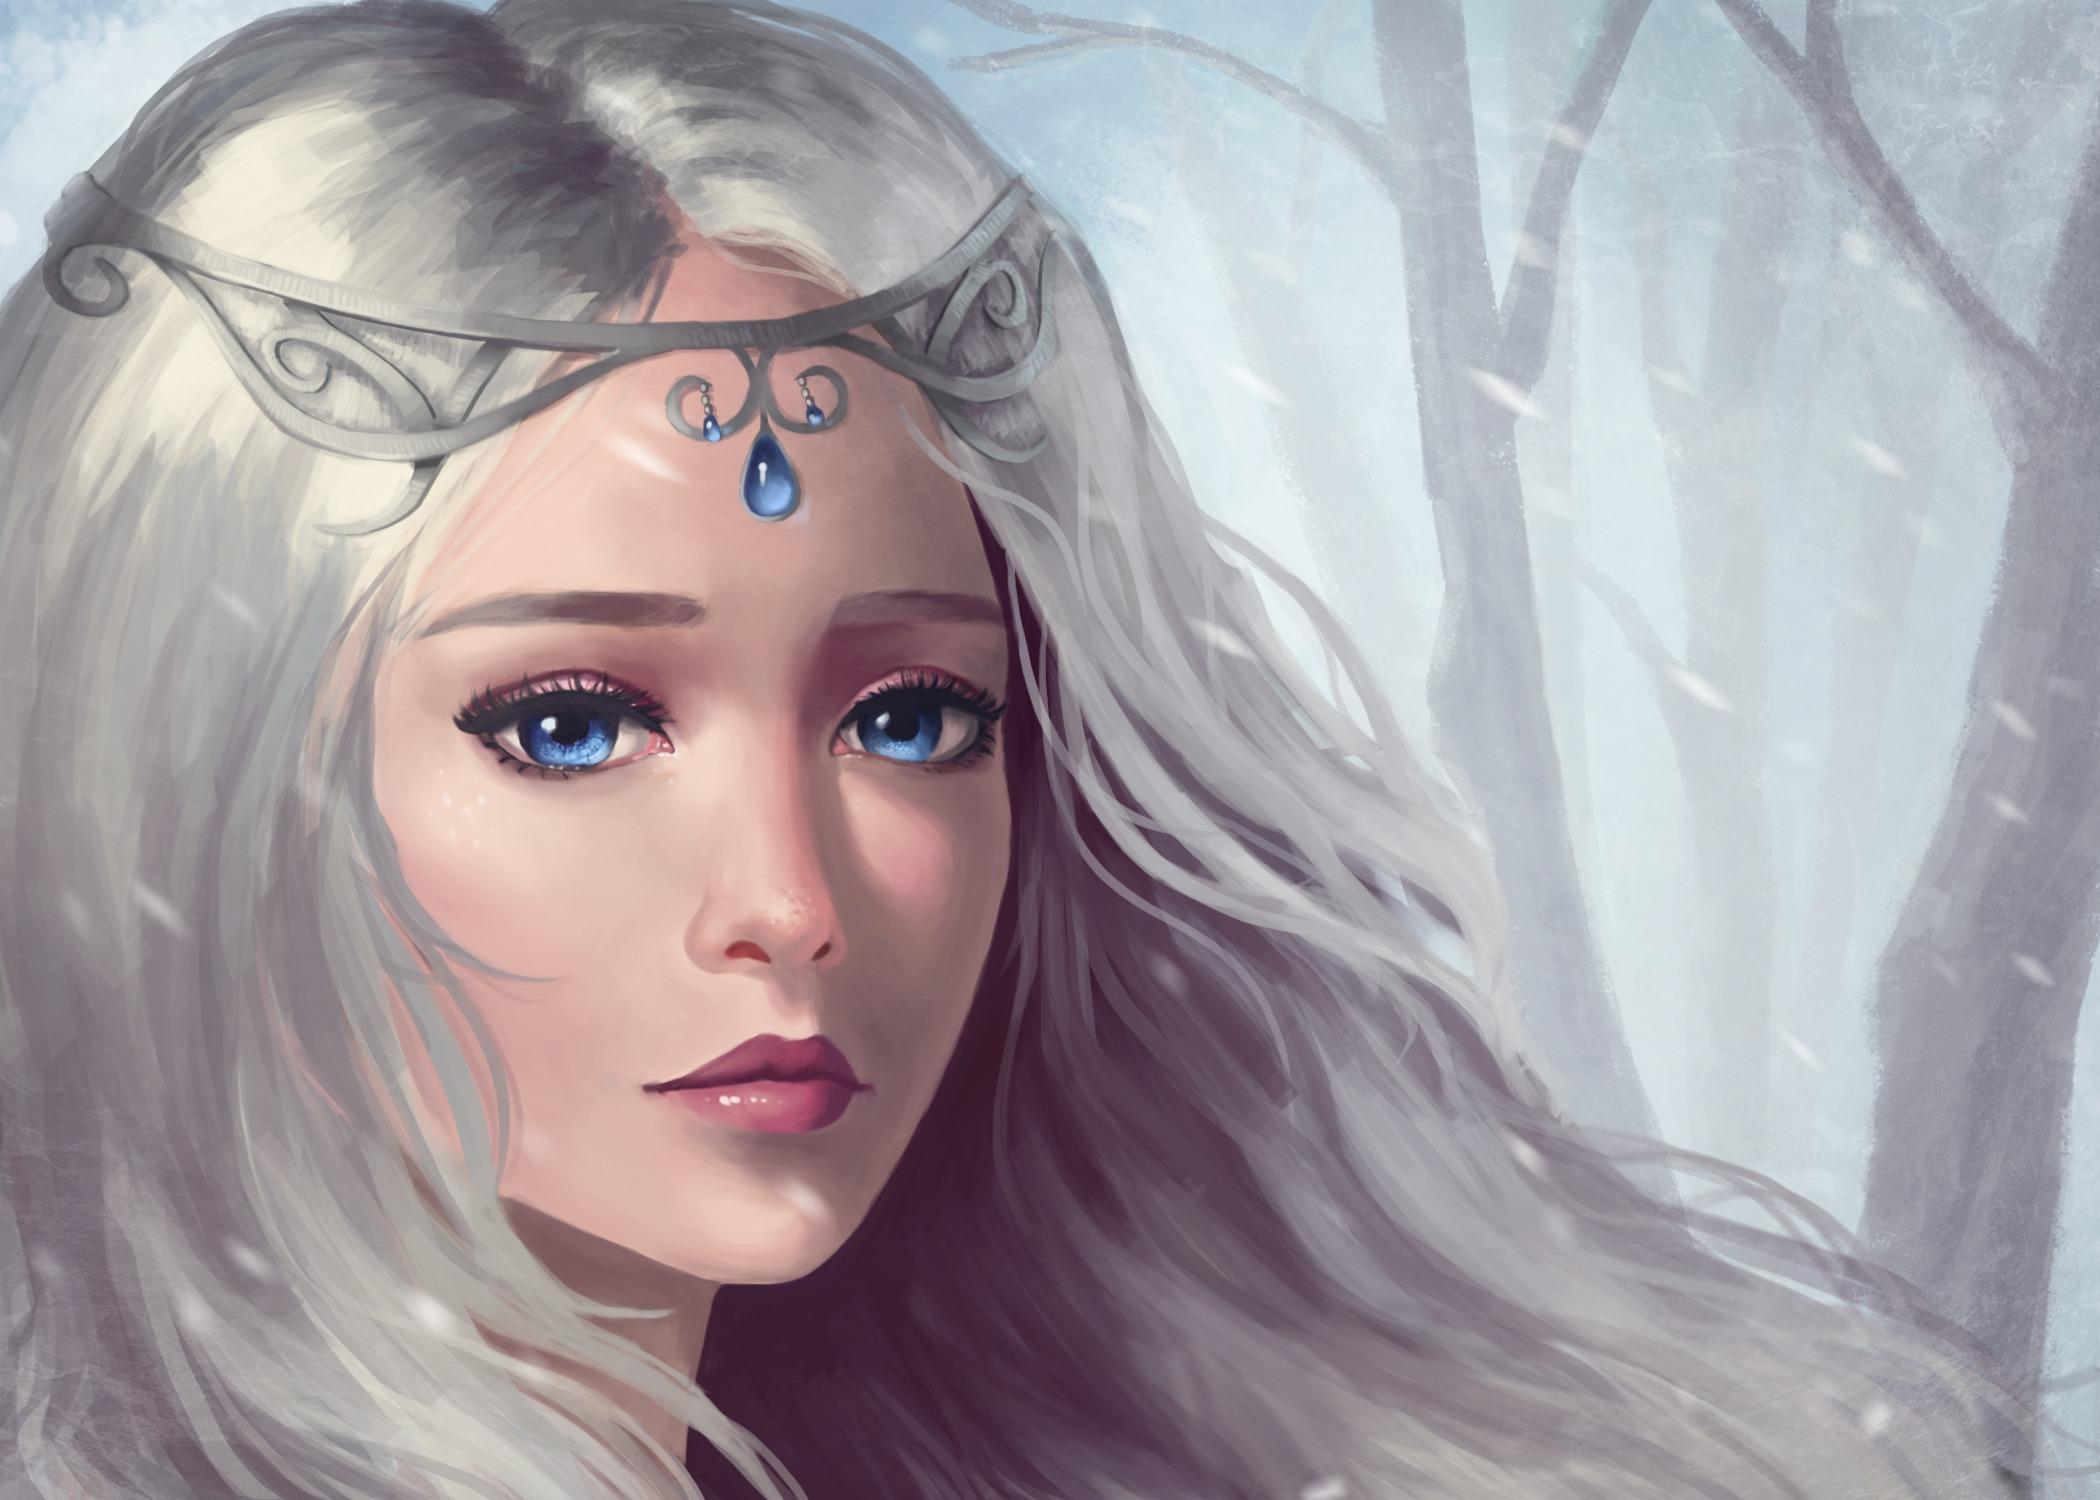 women fantasy eyes blue - photo #44